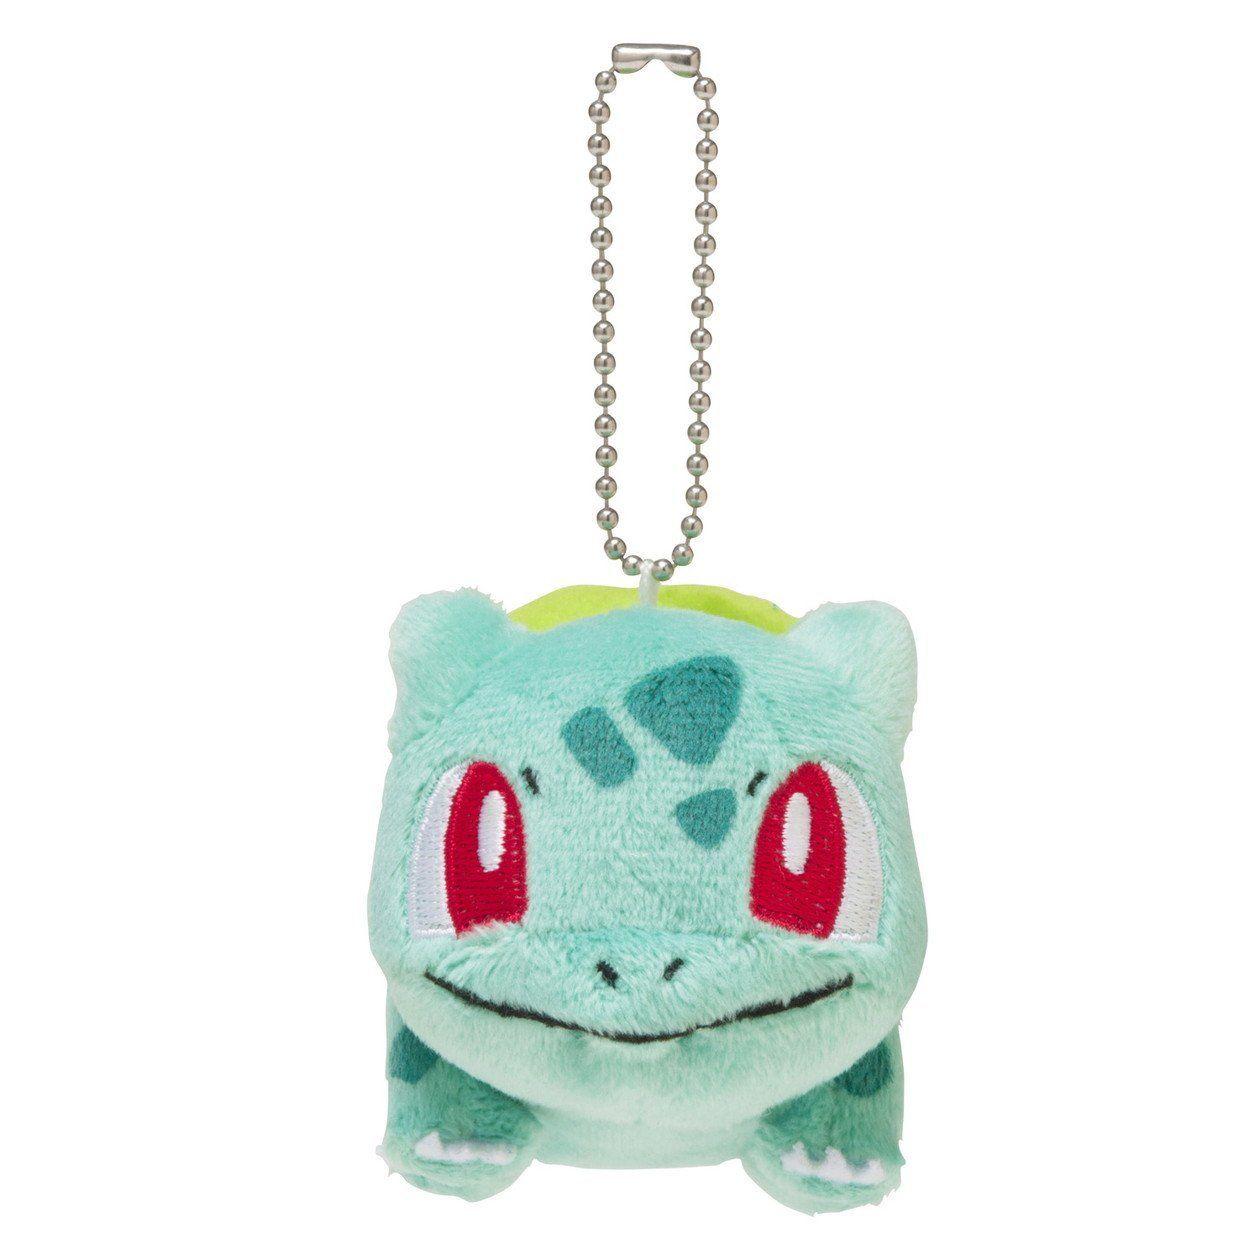 amazon.co.jp | ポケモンセンターオリジナル マスコット pokemon petit